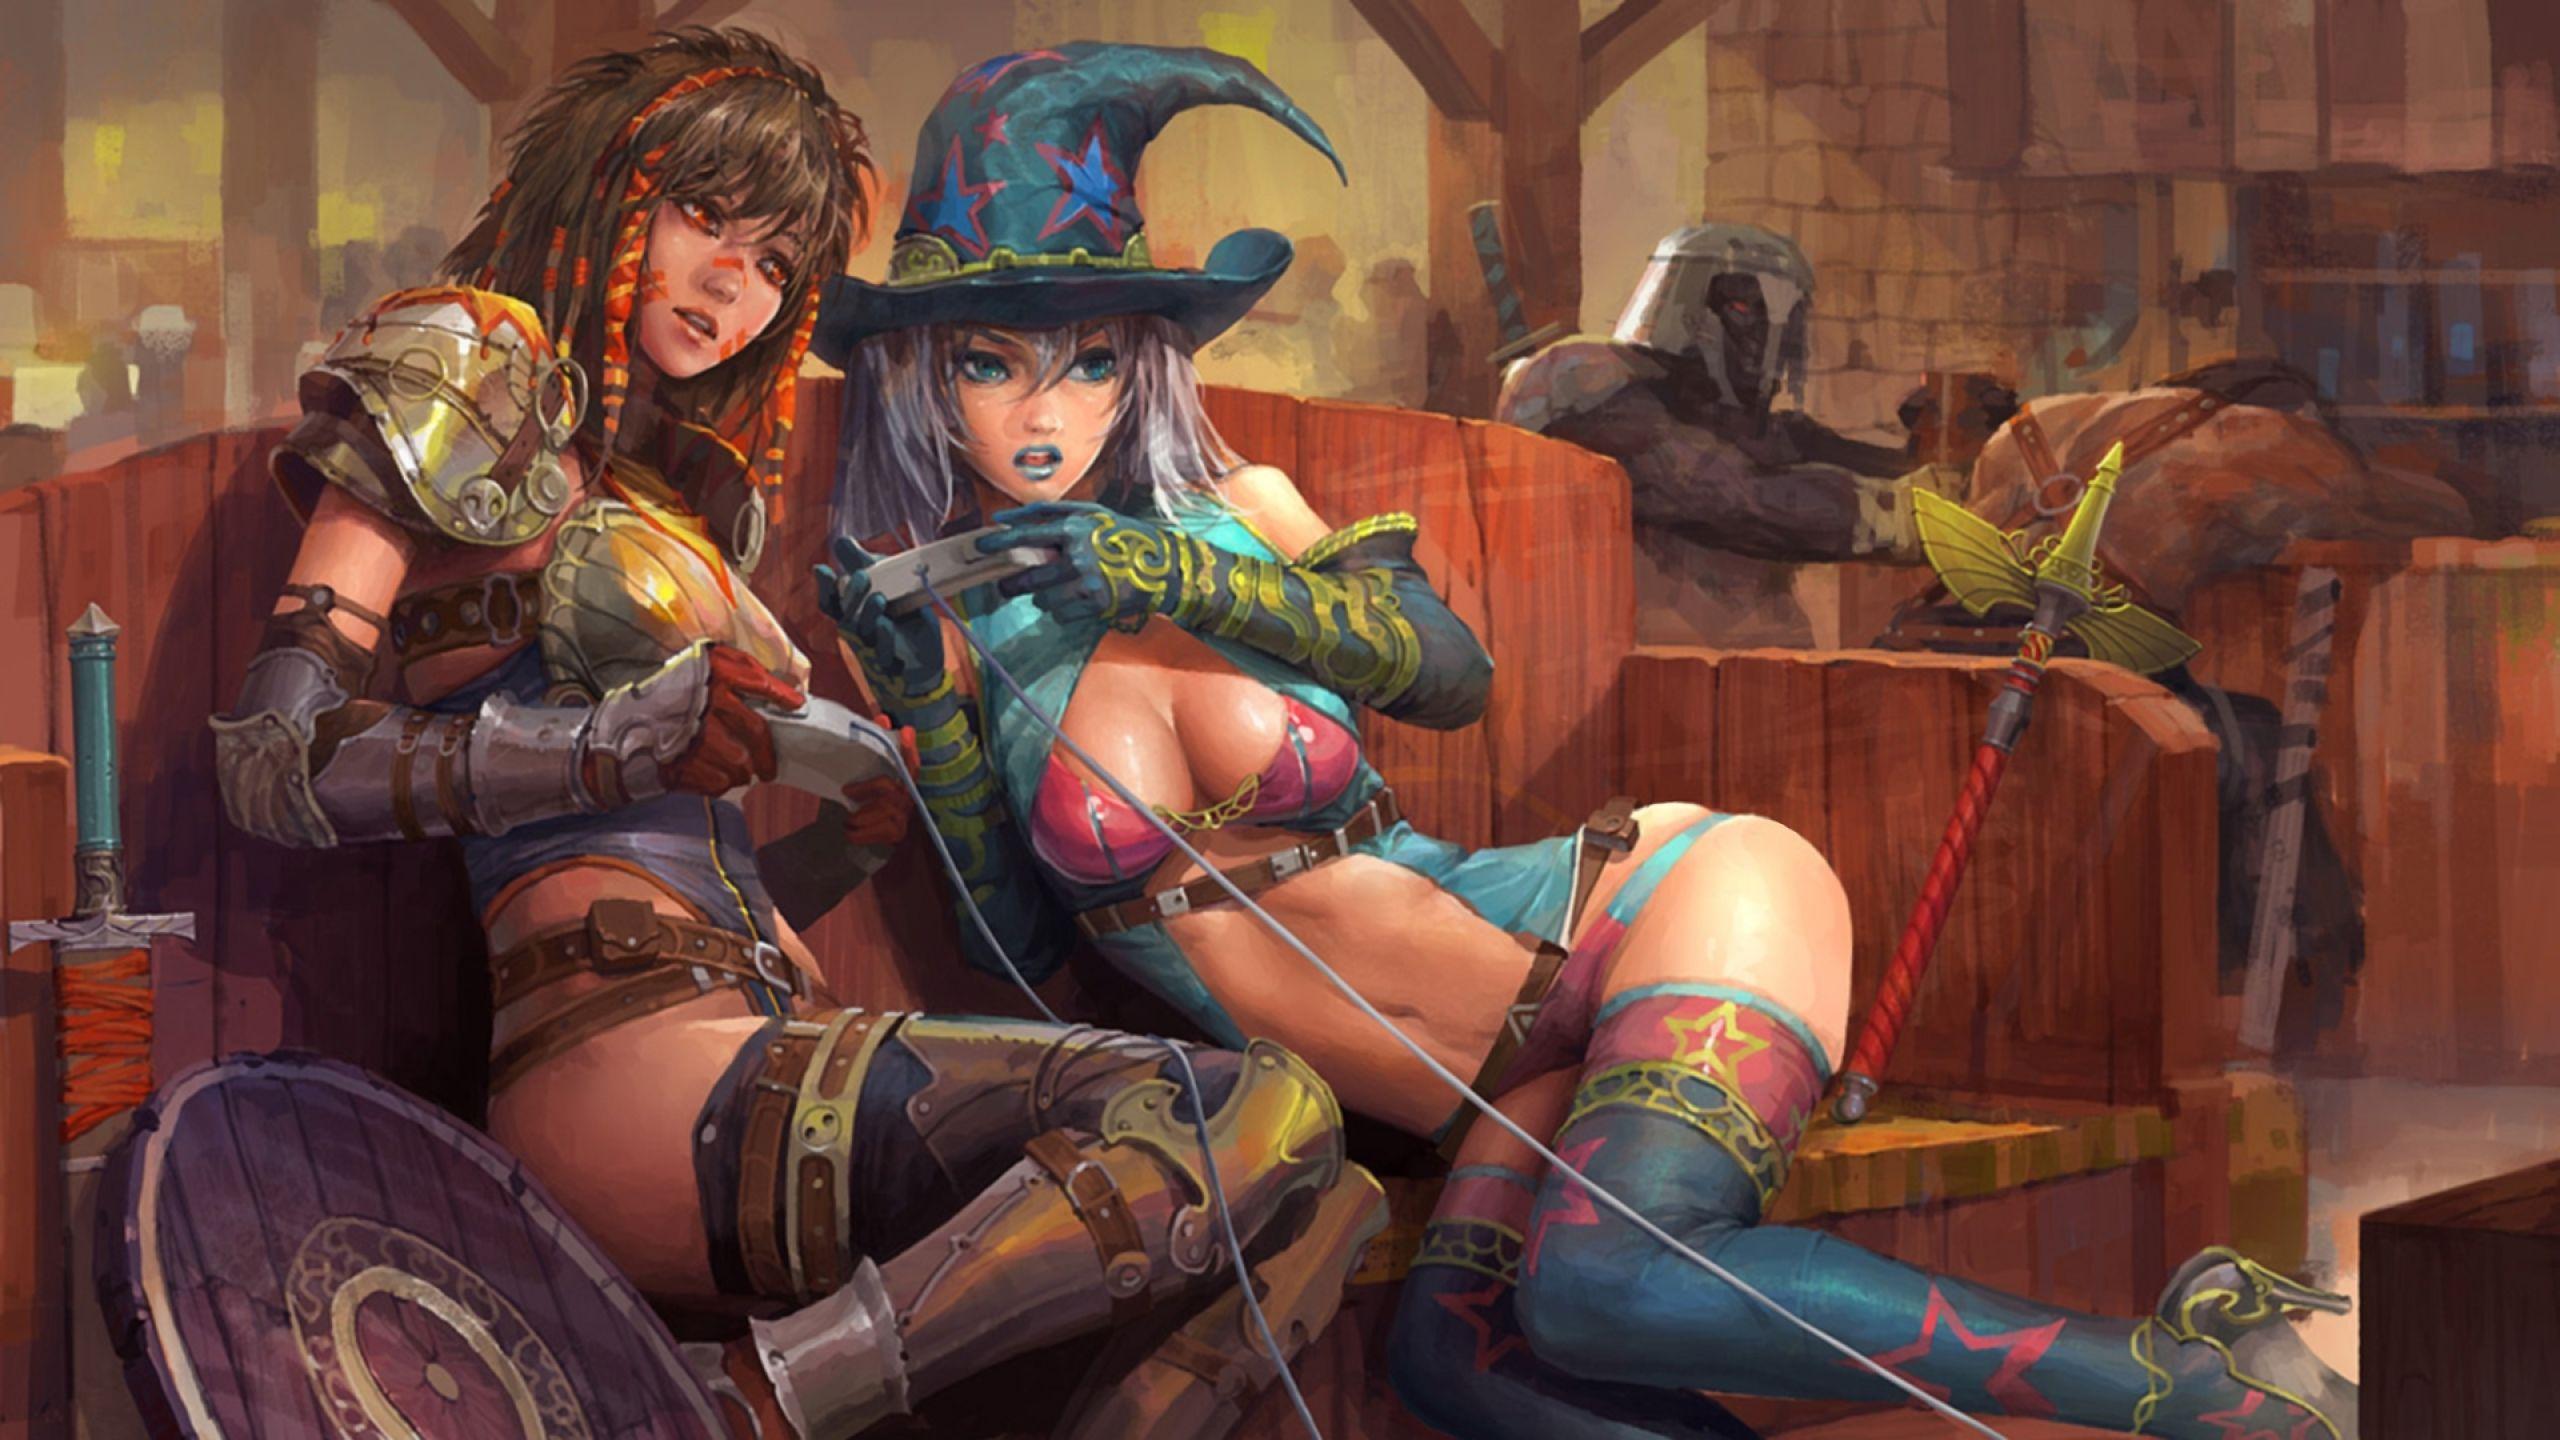 Hot girls play nintendo